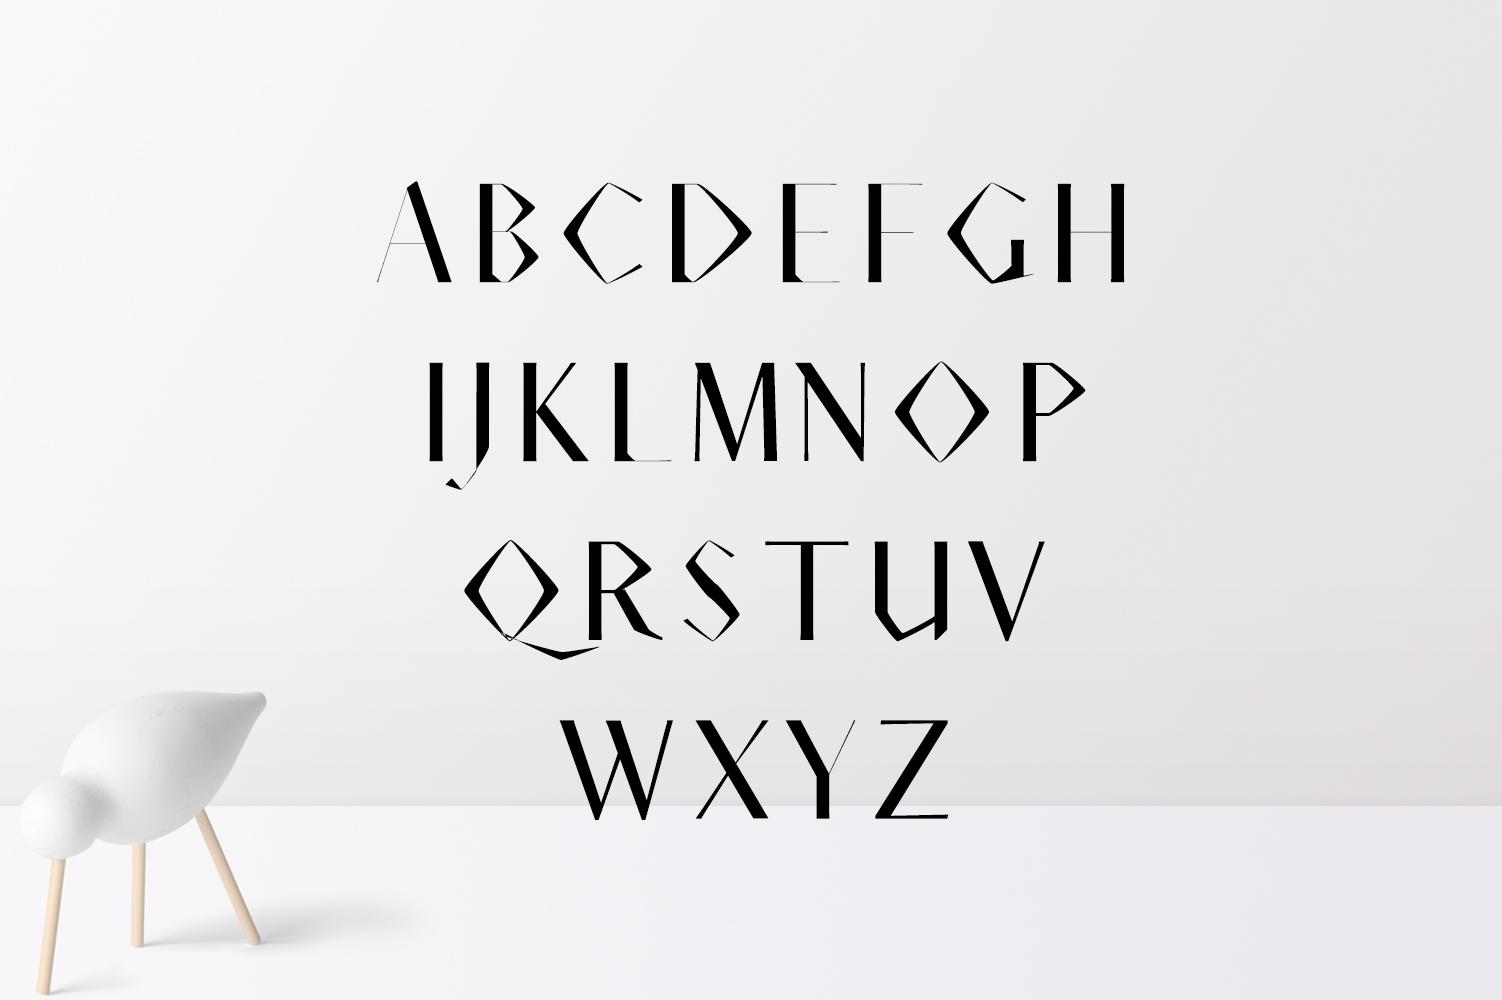 Acacio Serif 2 Font Family Pack example image 2